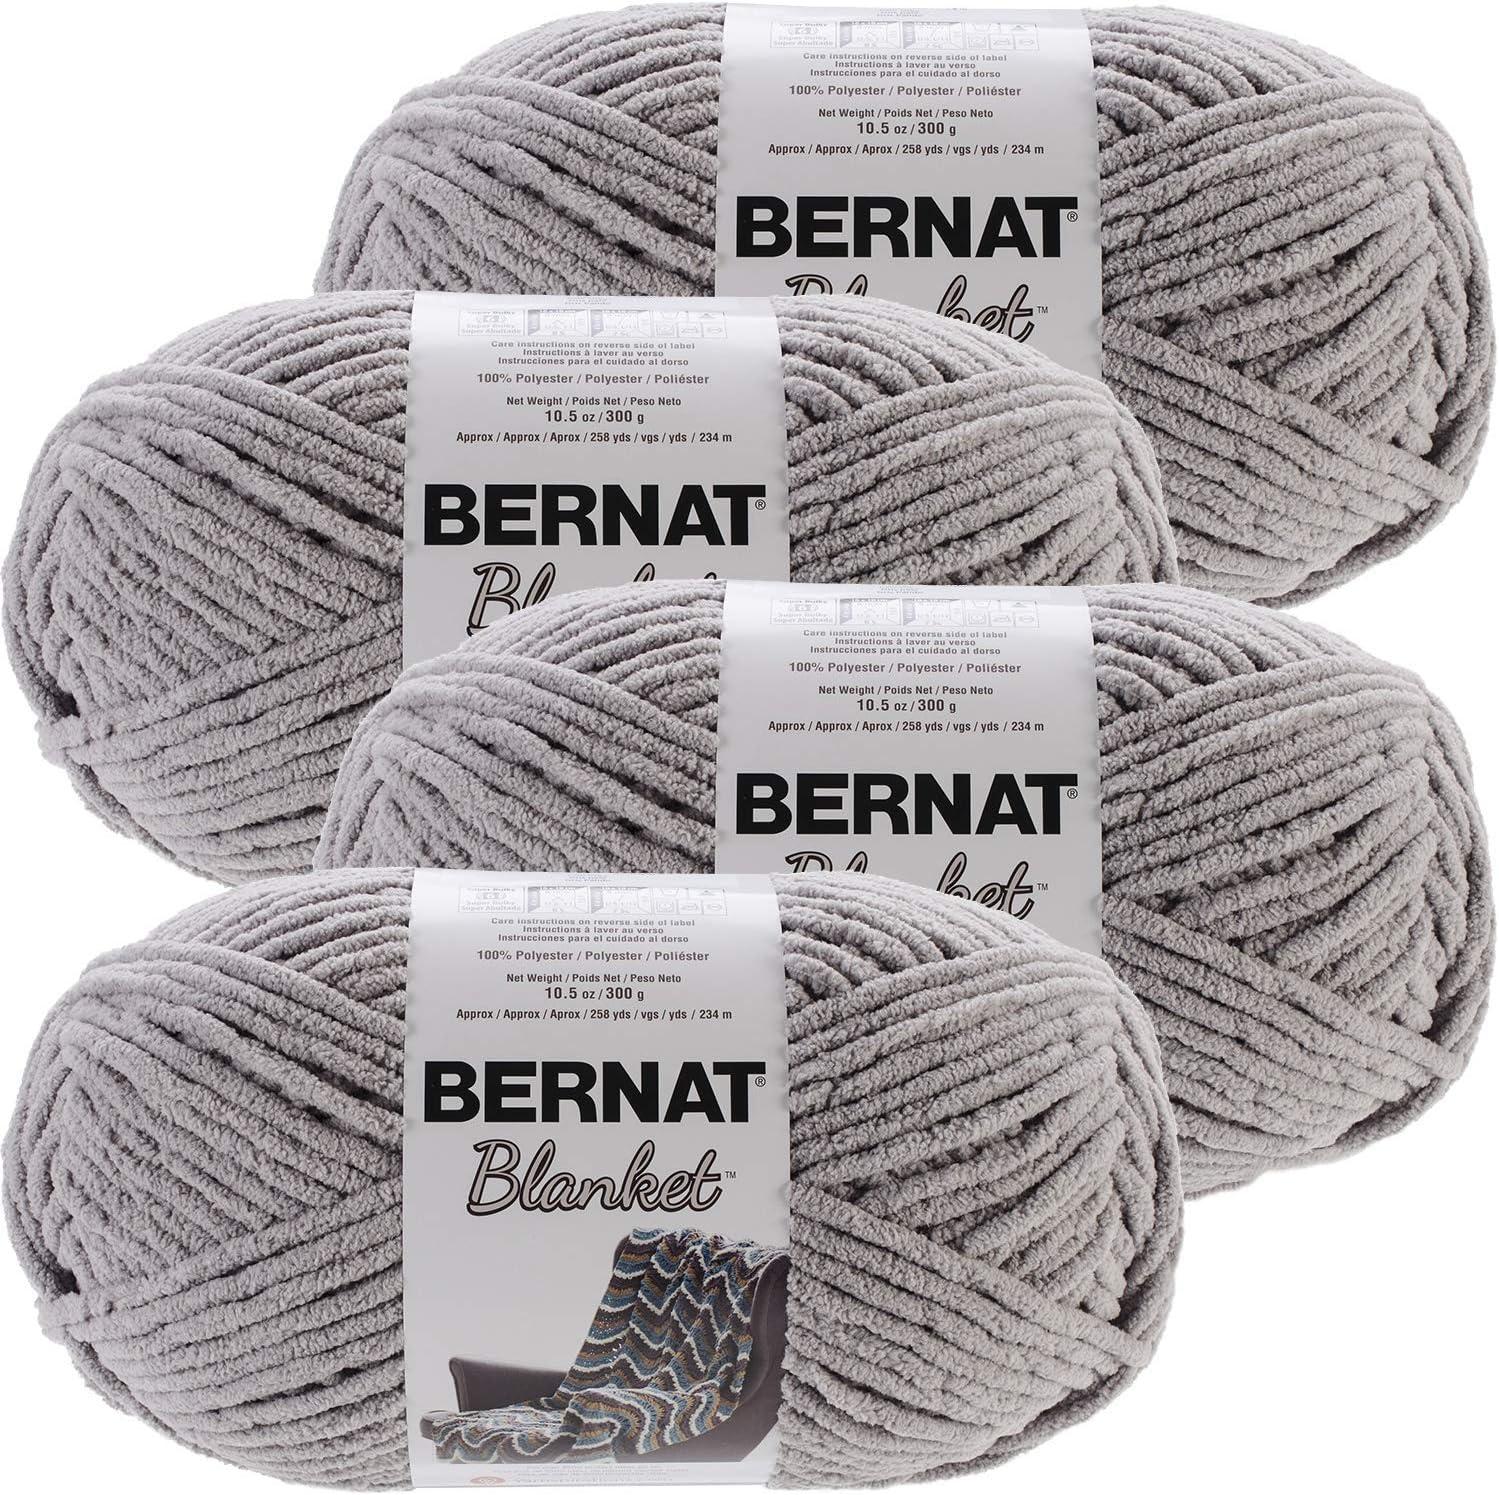 Choice Bernat Blanket Big Ball Yarn Grey Pale Multipack 4 Sales Gray P of